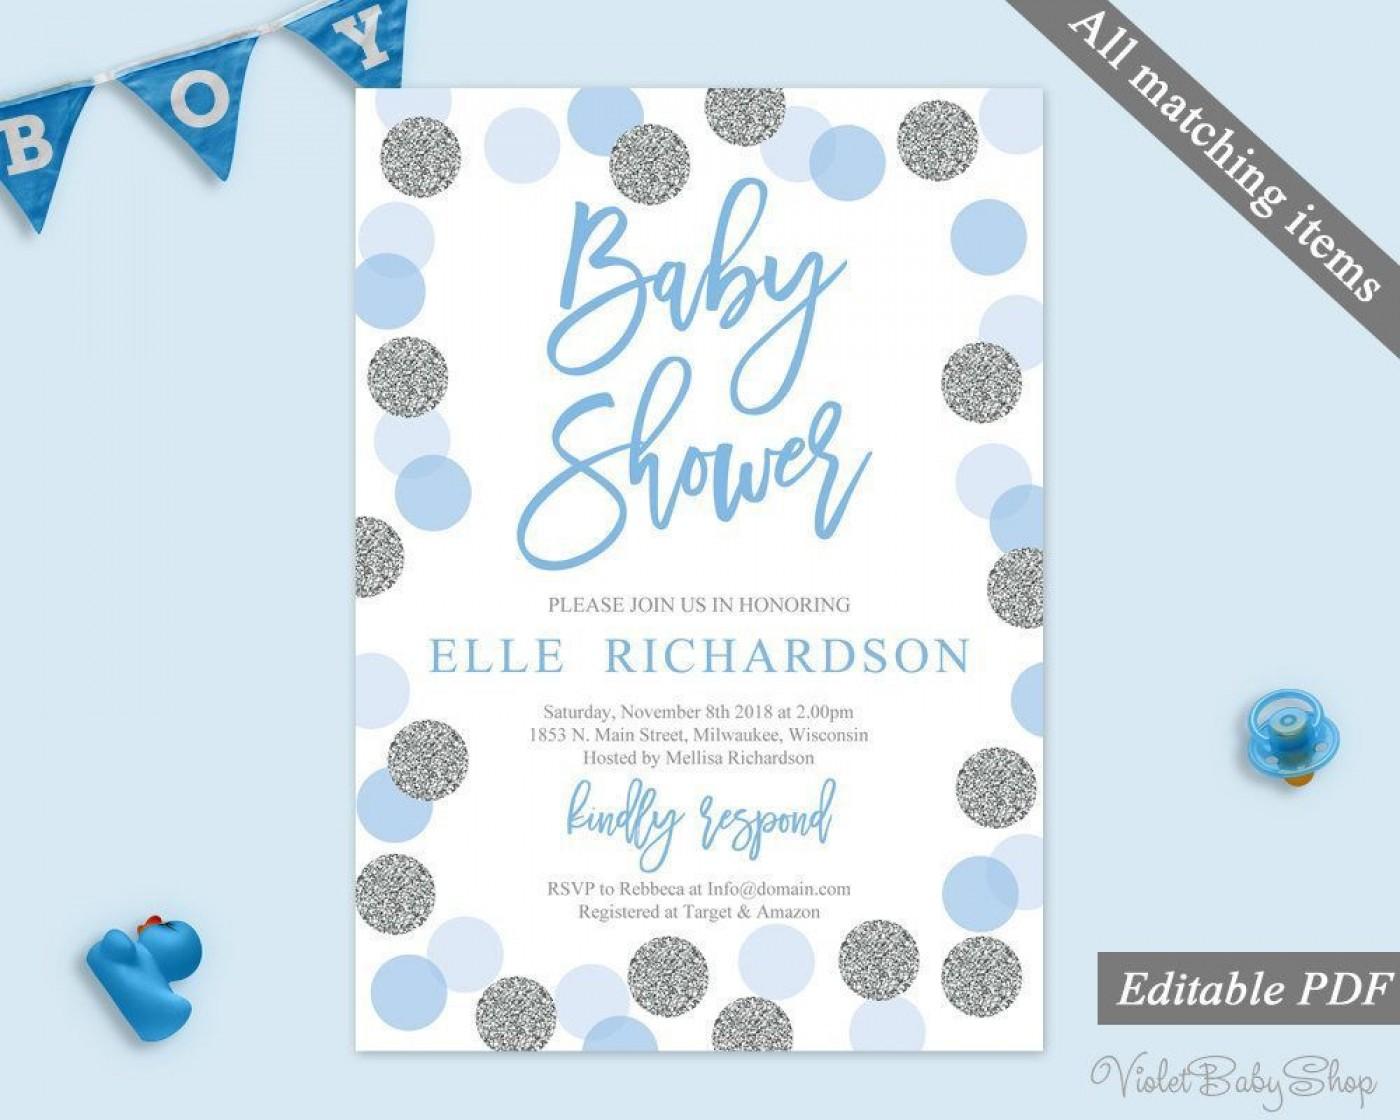 002 Imposing Baby Shower Invitation Template Microsoft Word Sample  Free Editable1400